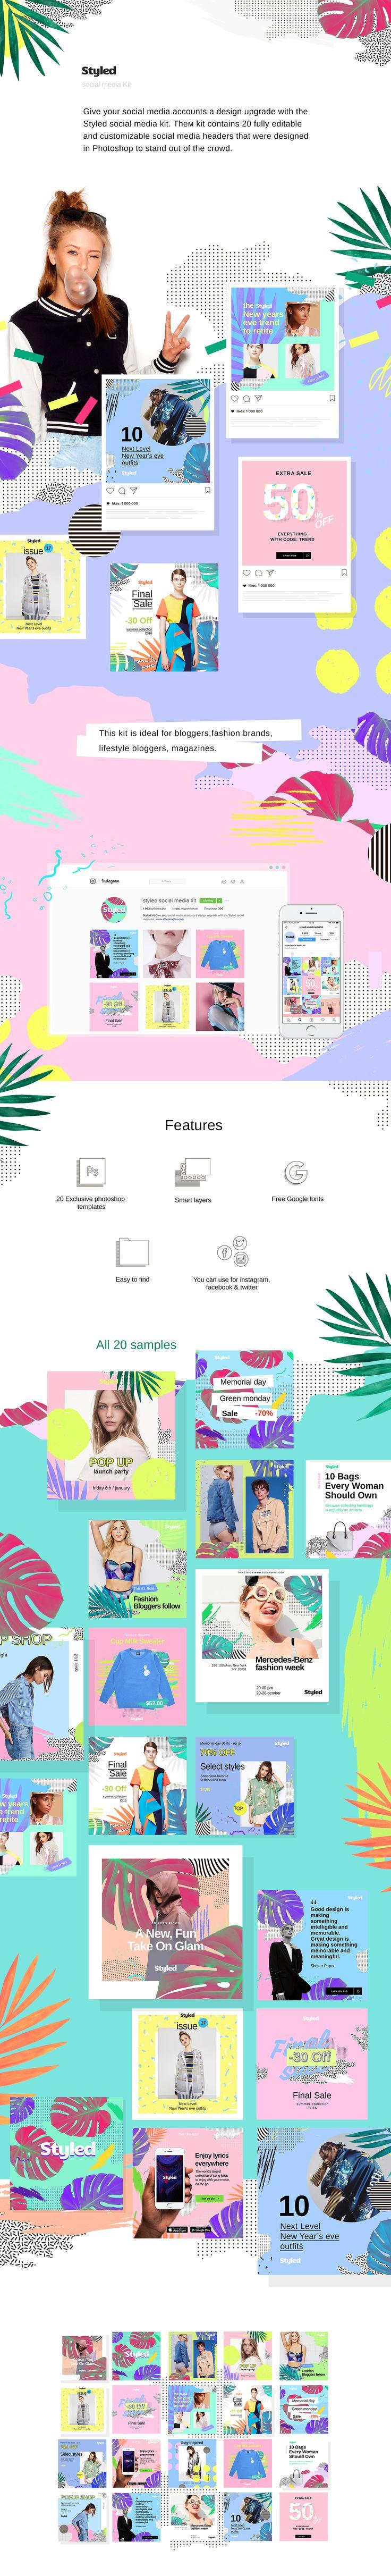 67 best Social Media Design images on Pinterest